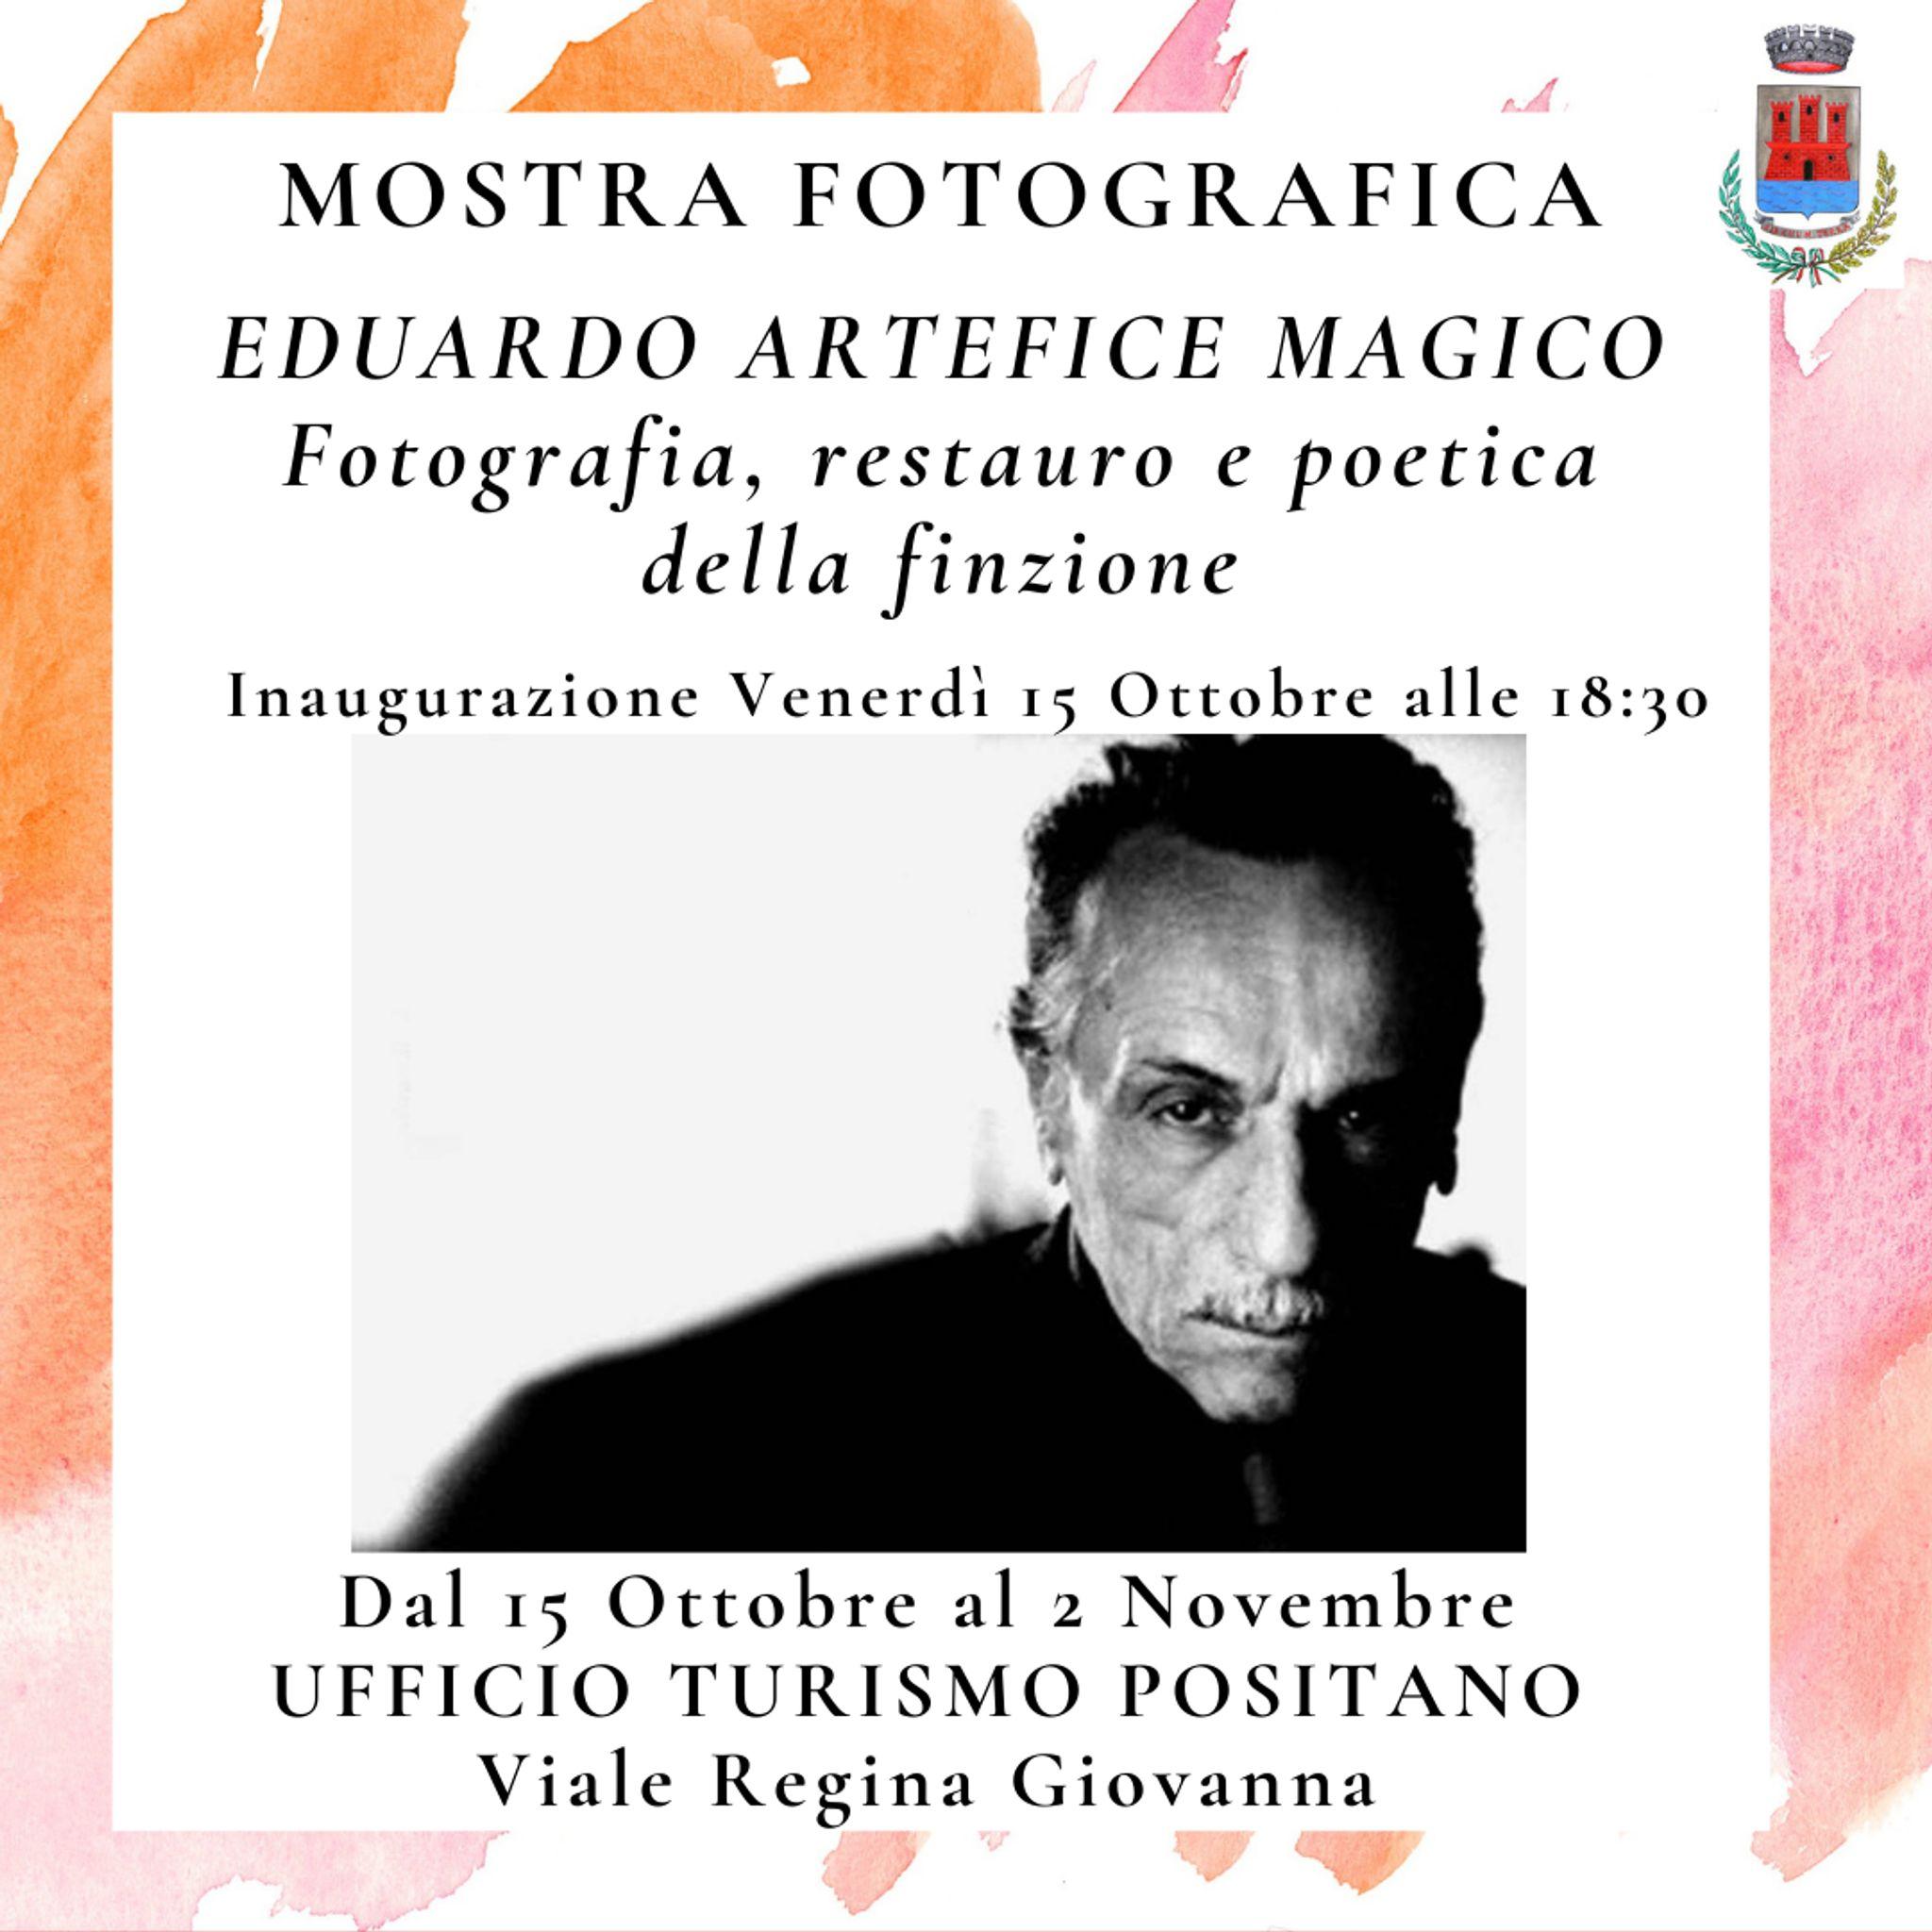 "Eduardo Artefice Magico"" photographic exhibition"